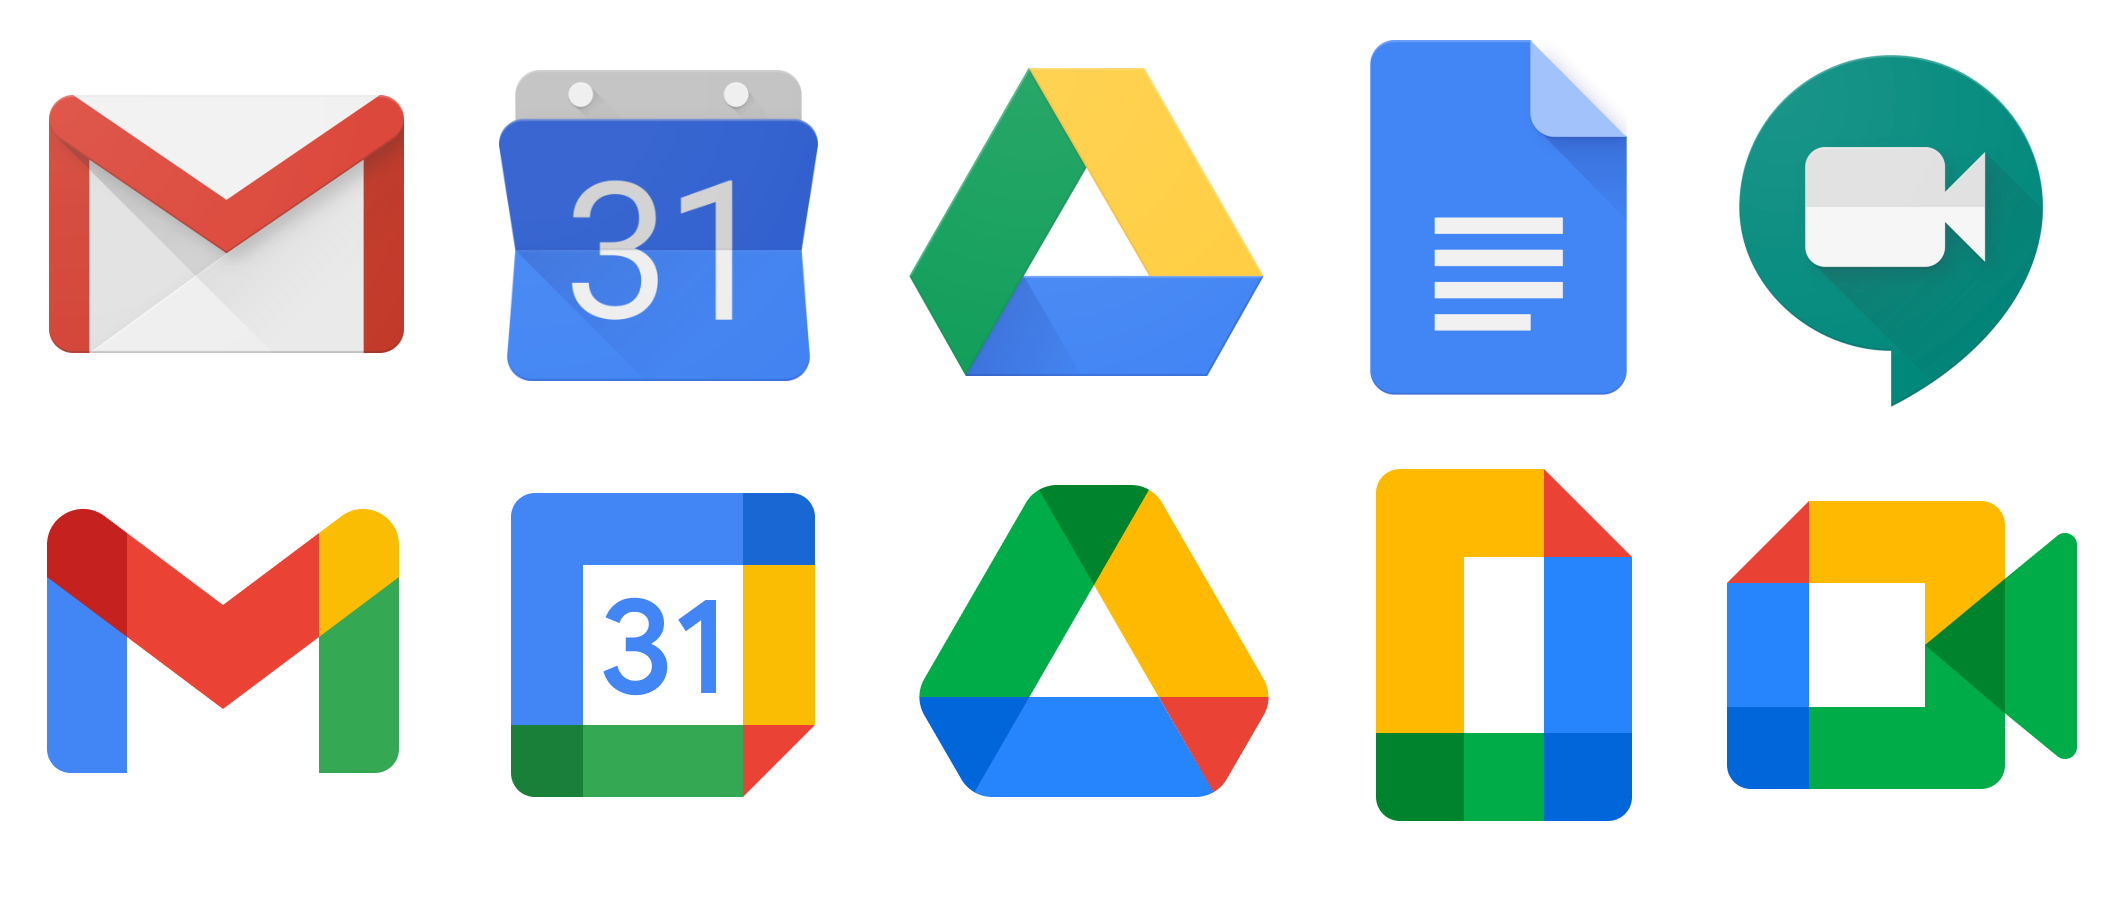 Google's new logos are bad | TechCrunch